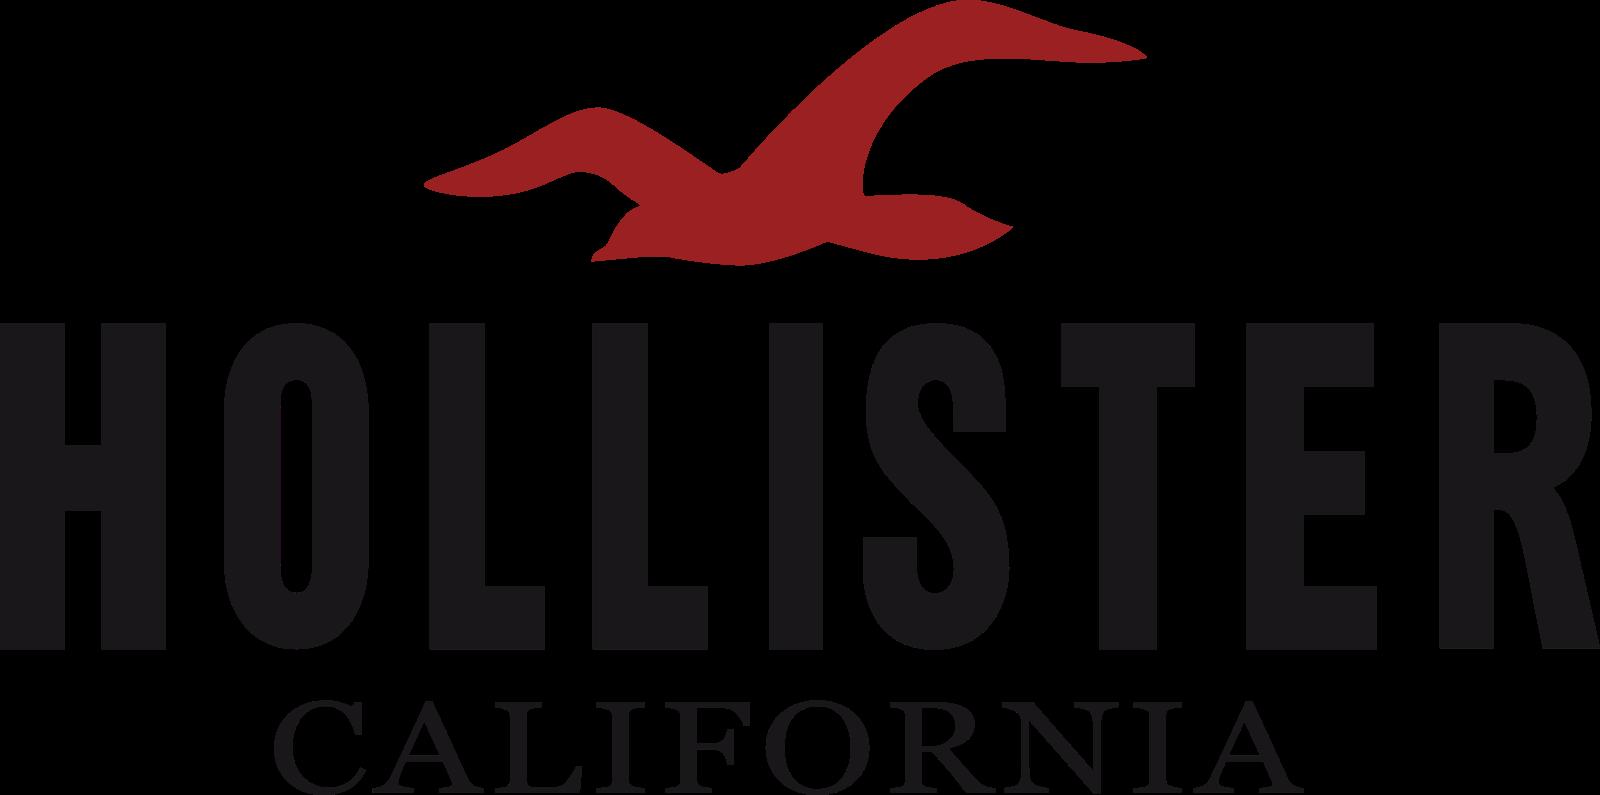 hollister-logo-8